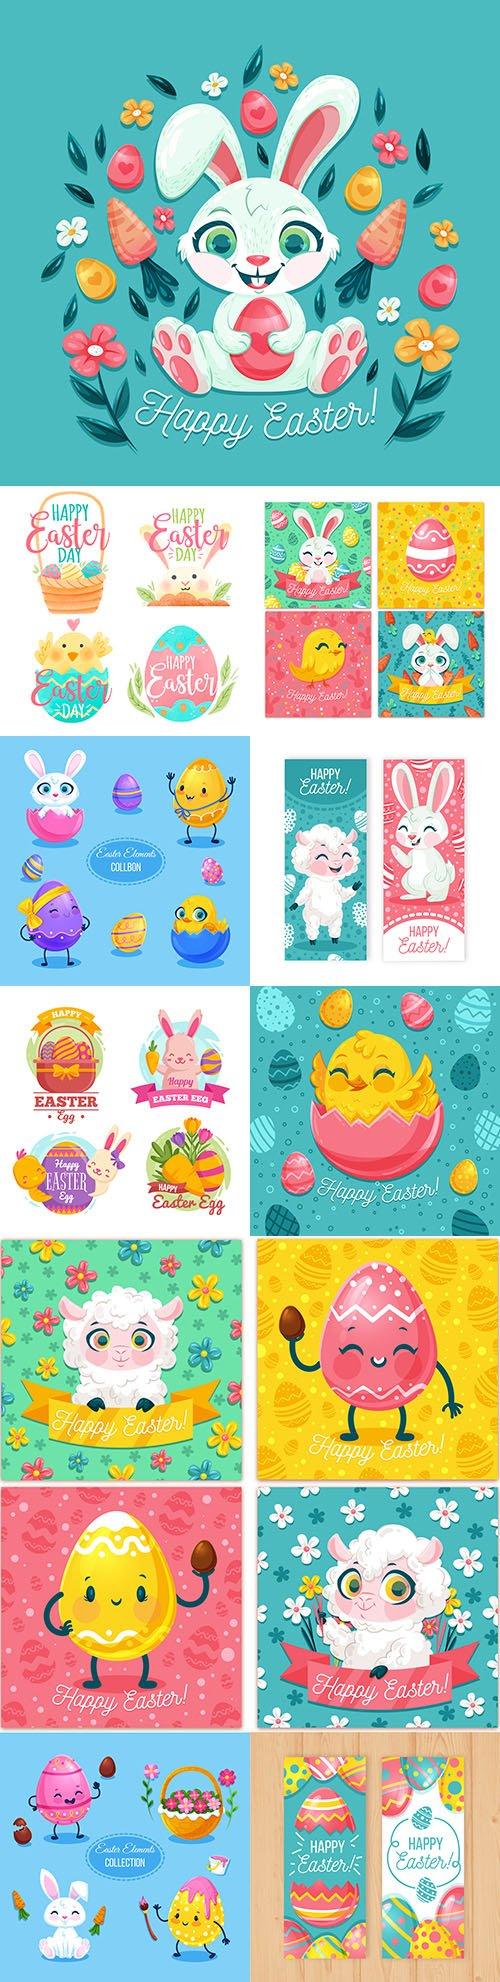 Happy Easter flat design collection elements llustration